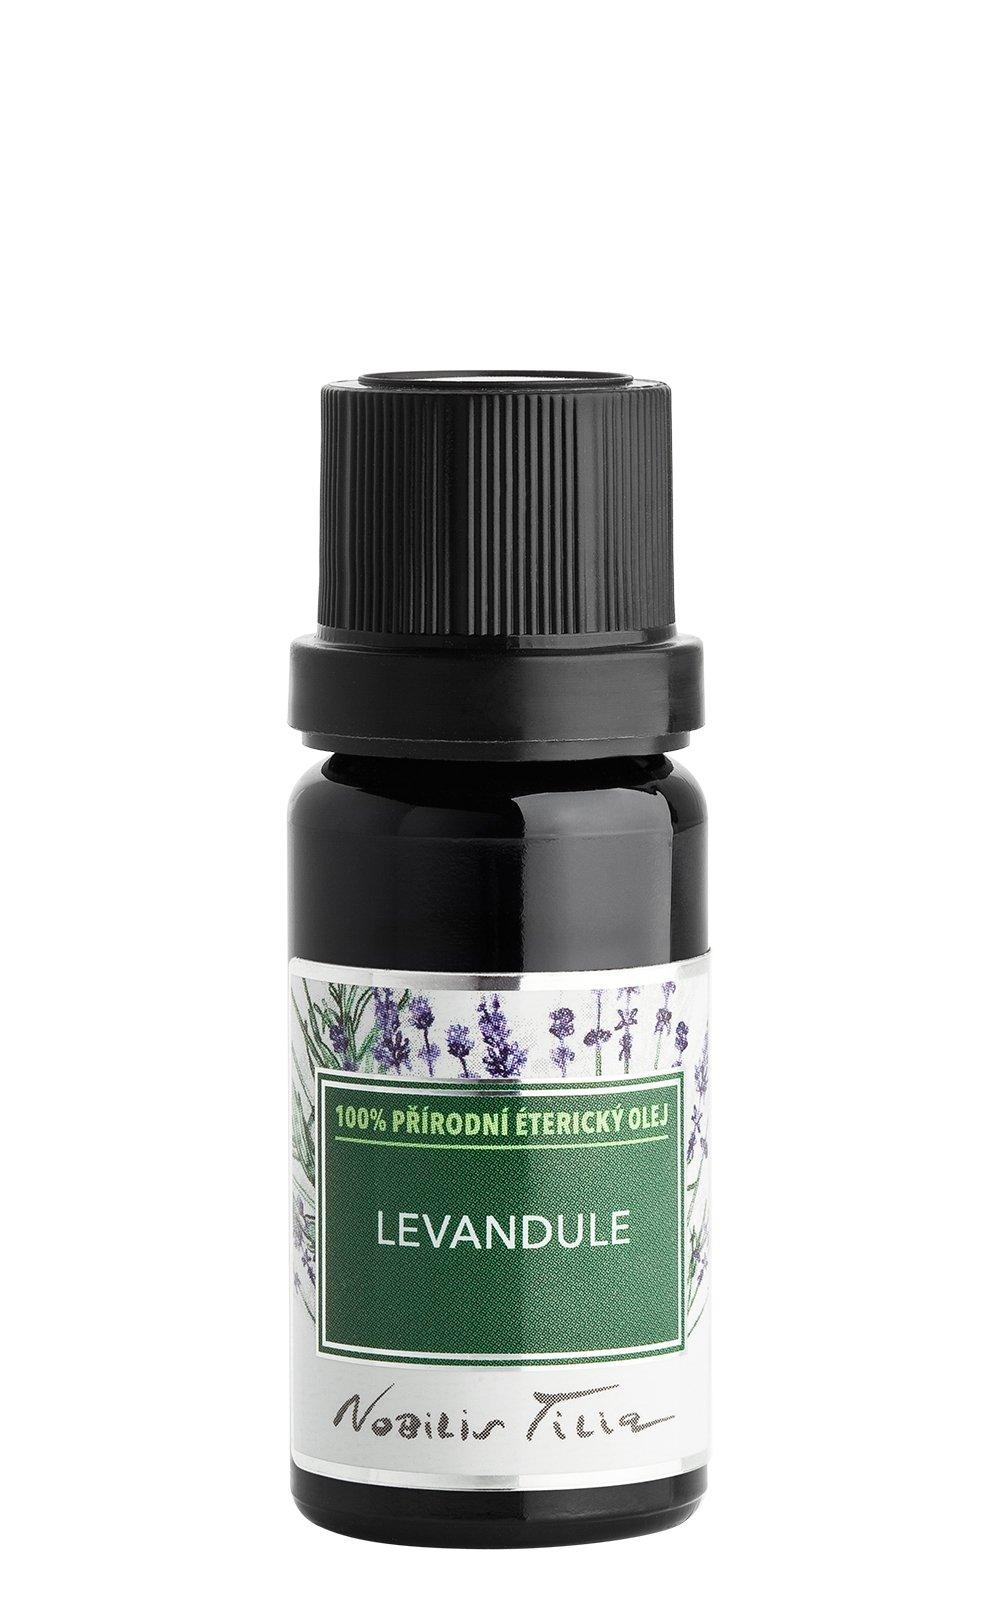 Éterický olej Levandule: 20 ml